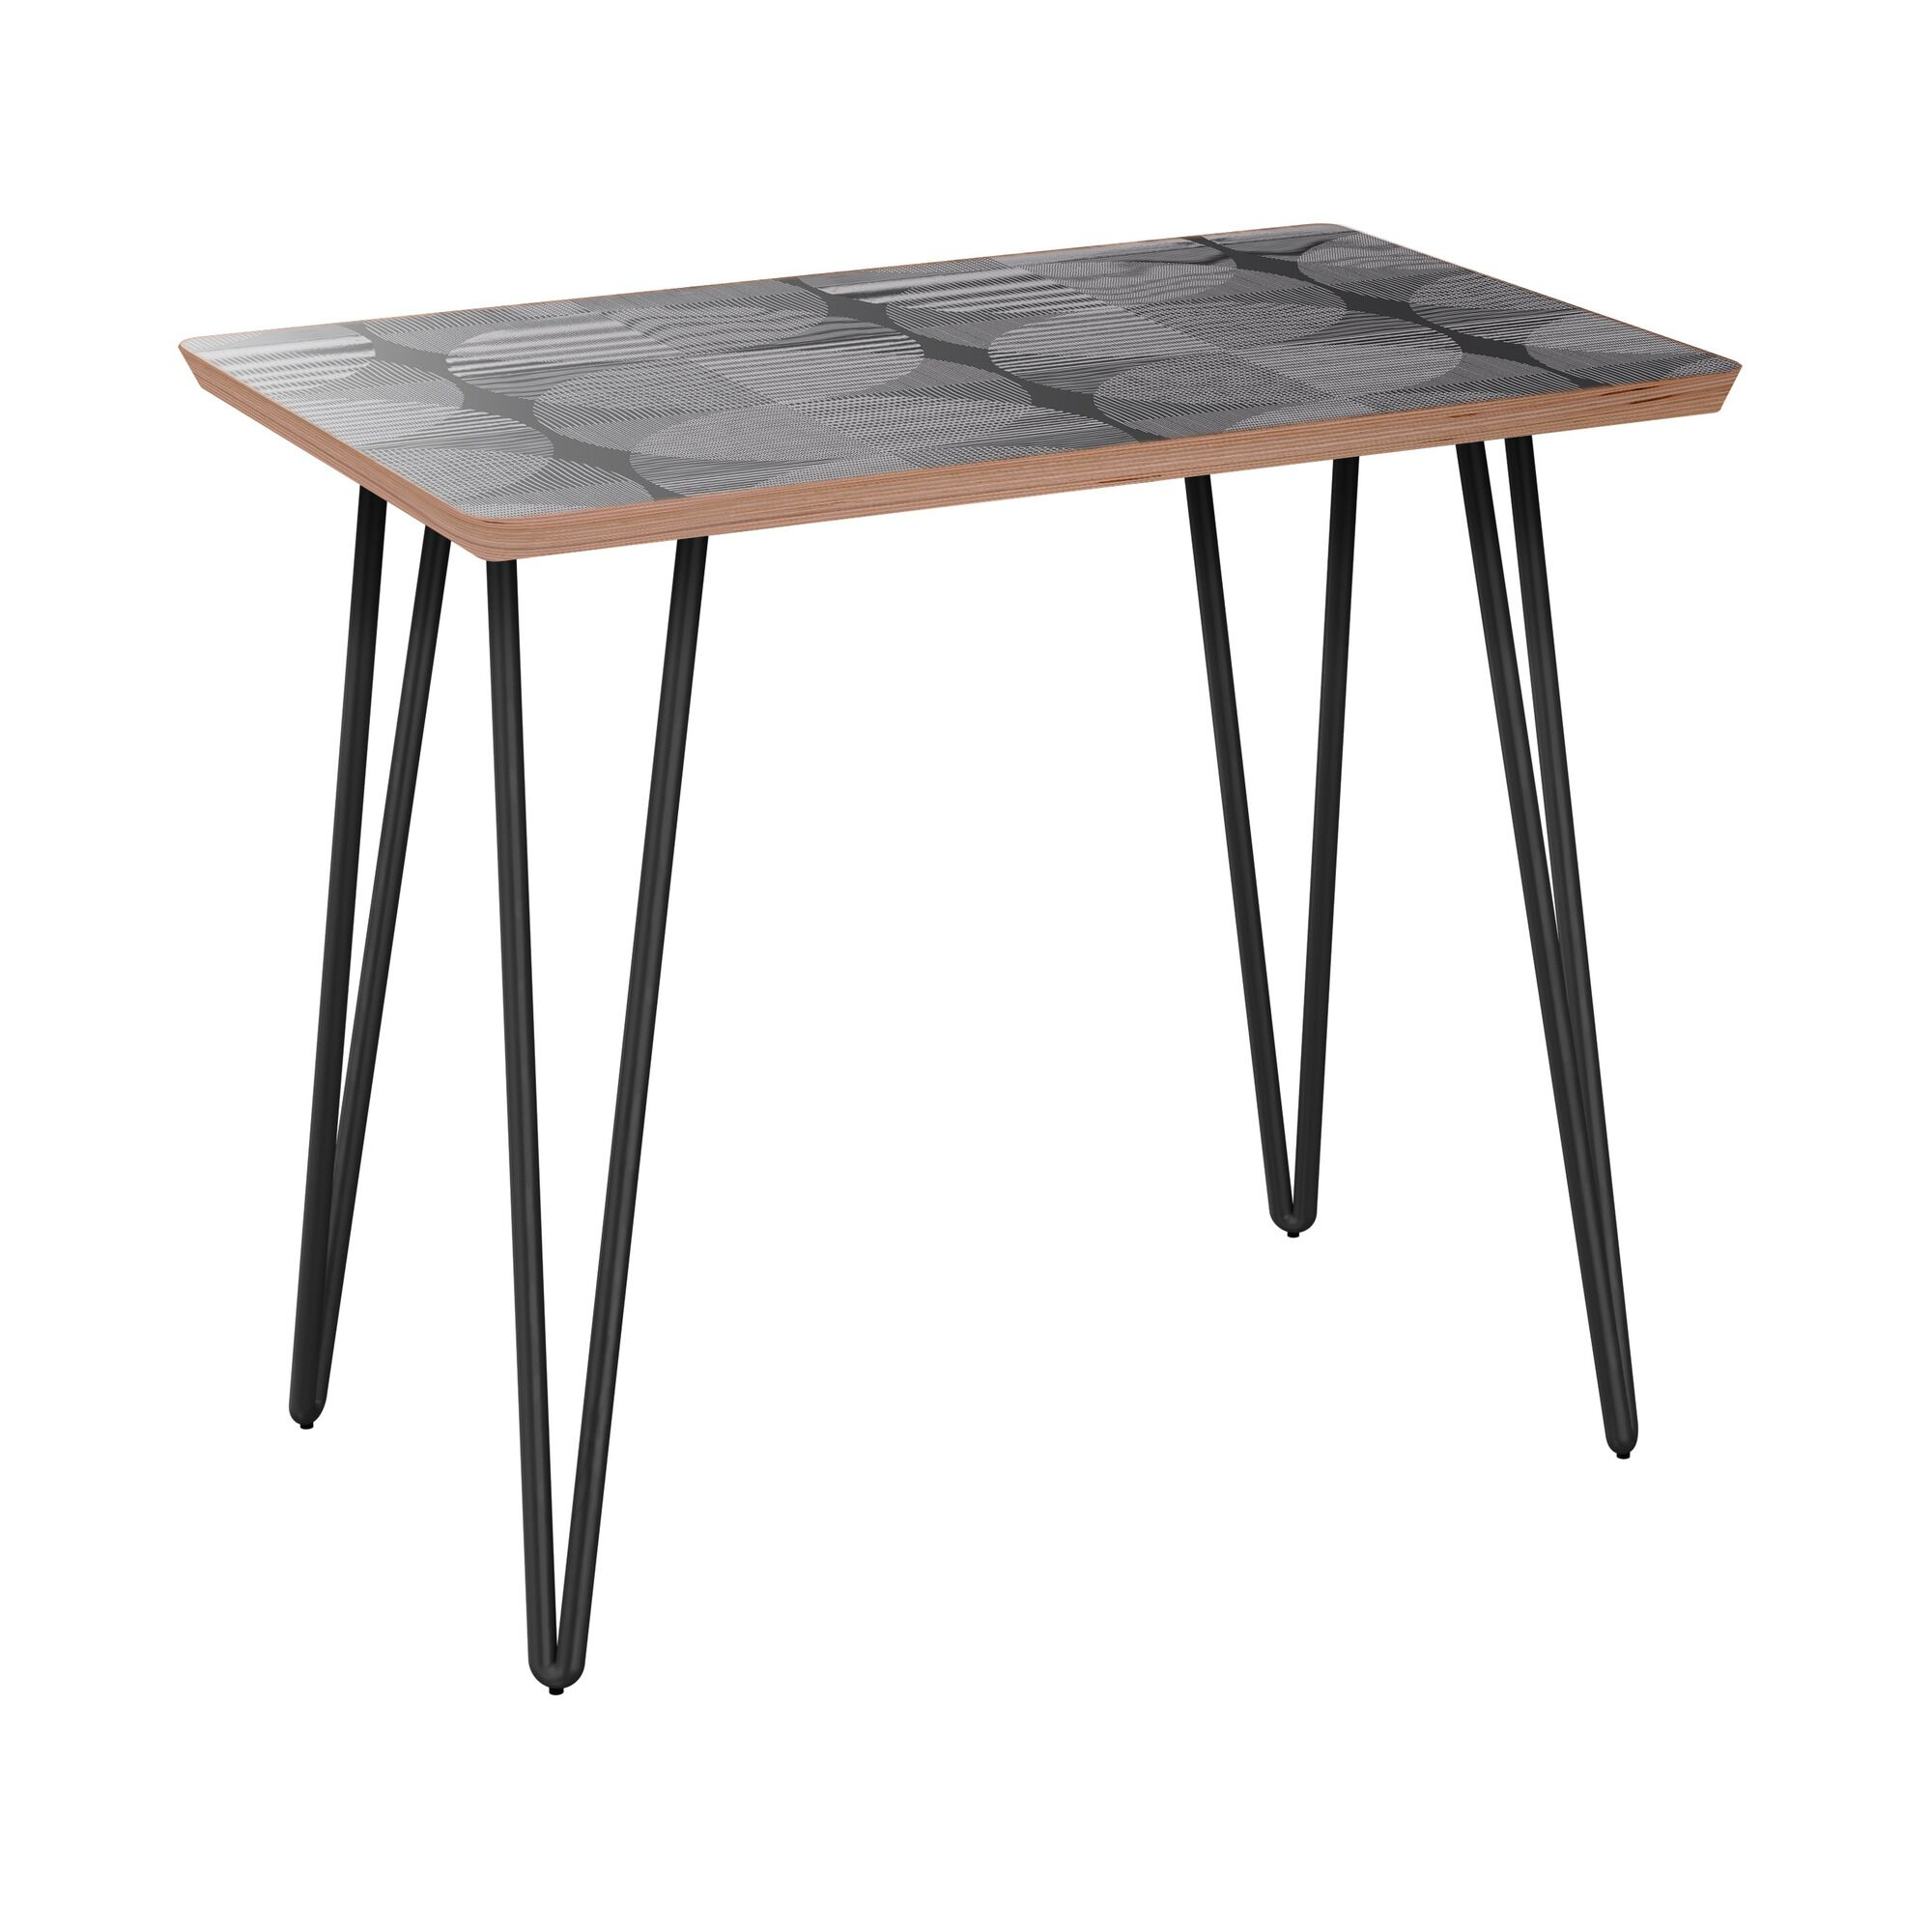 Eustis End Table Table Base Color: Black, Table Top Color: Walnut